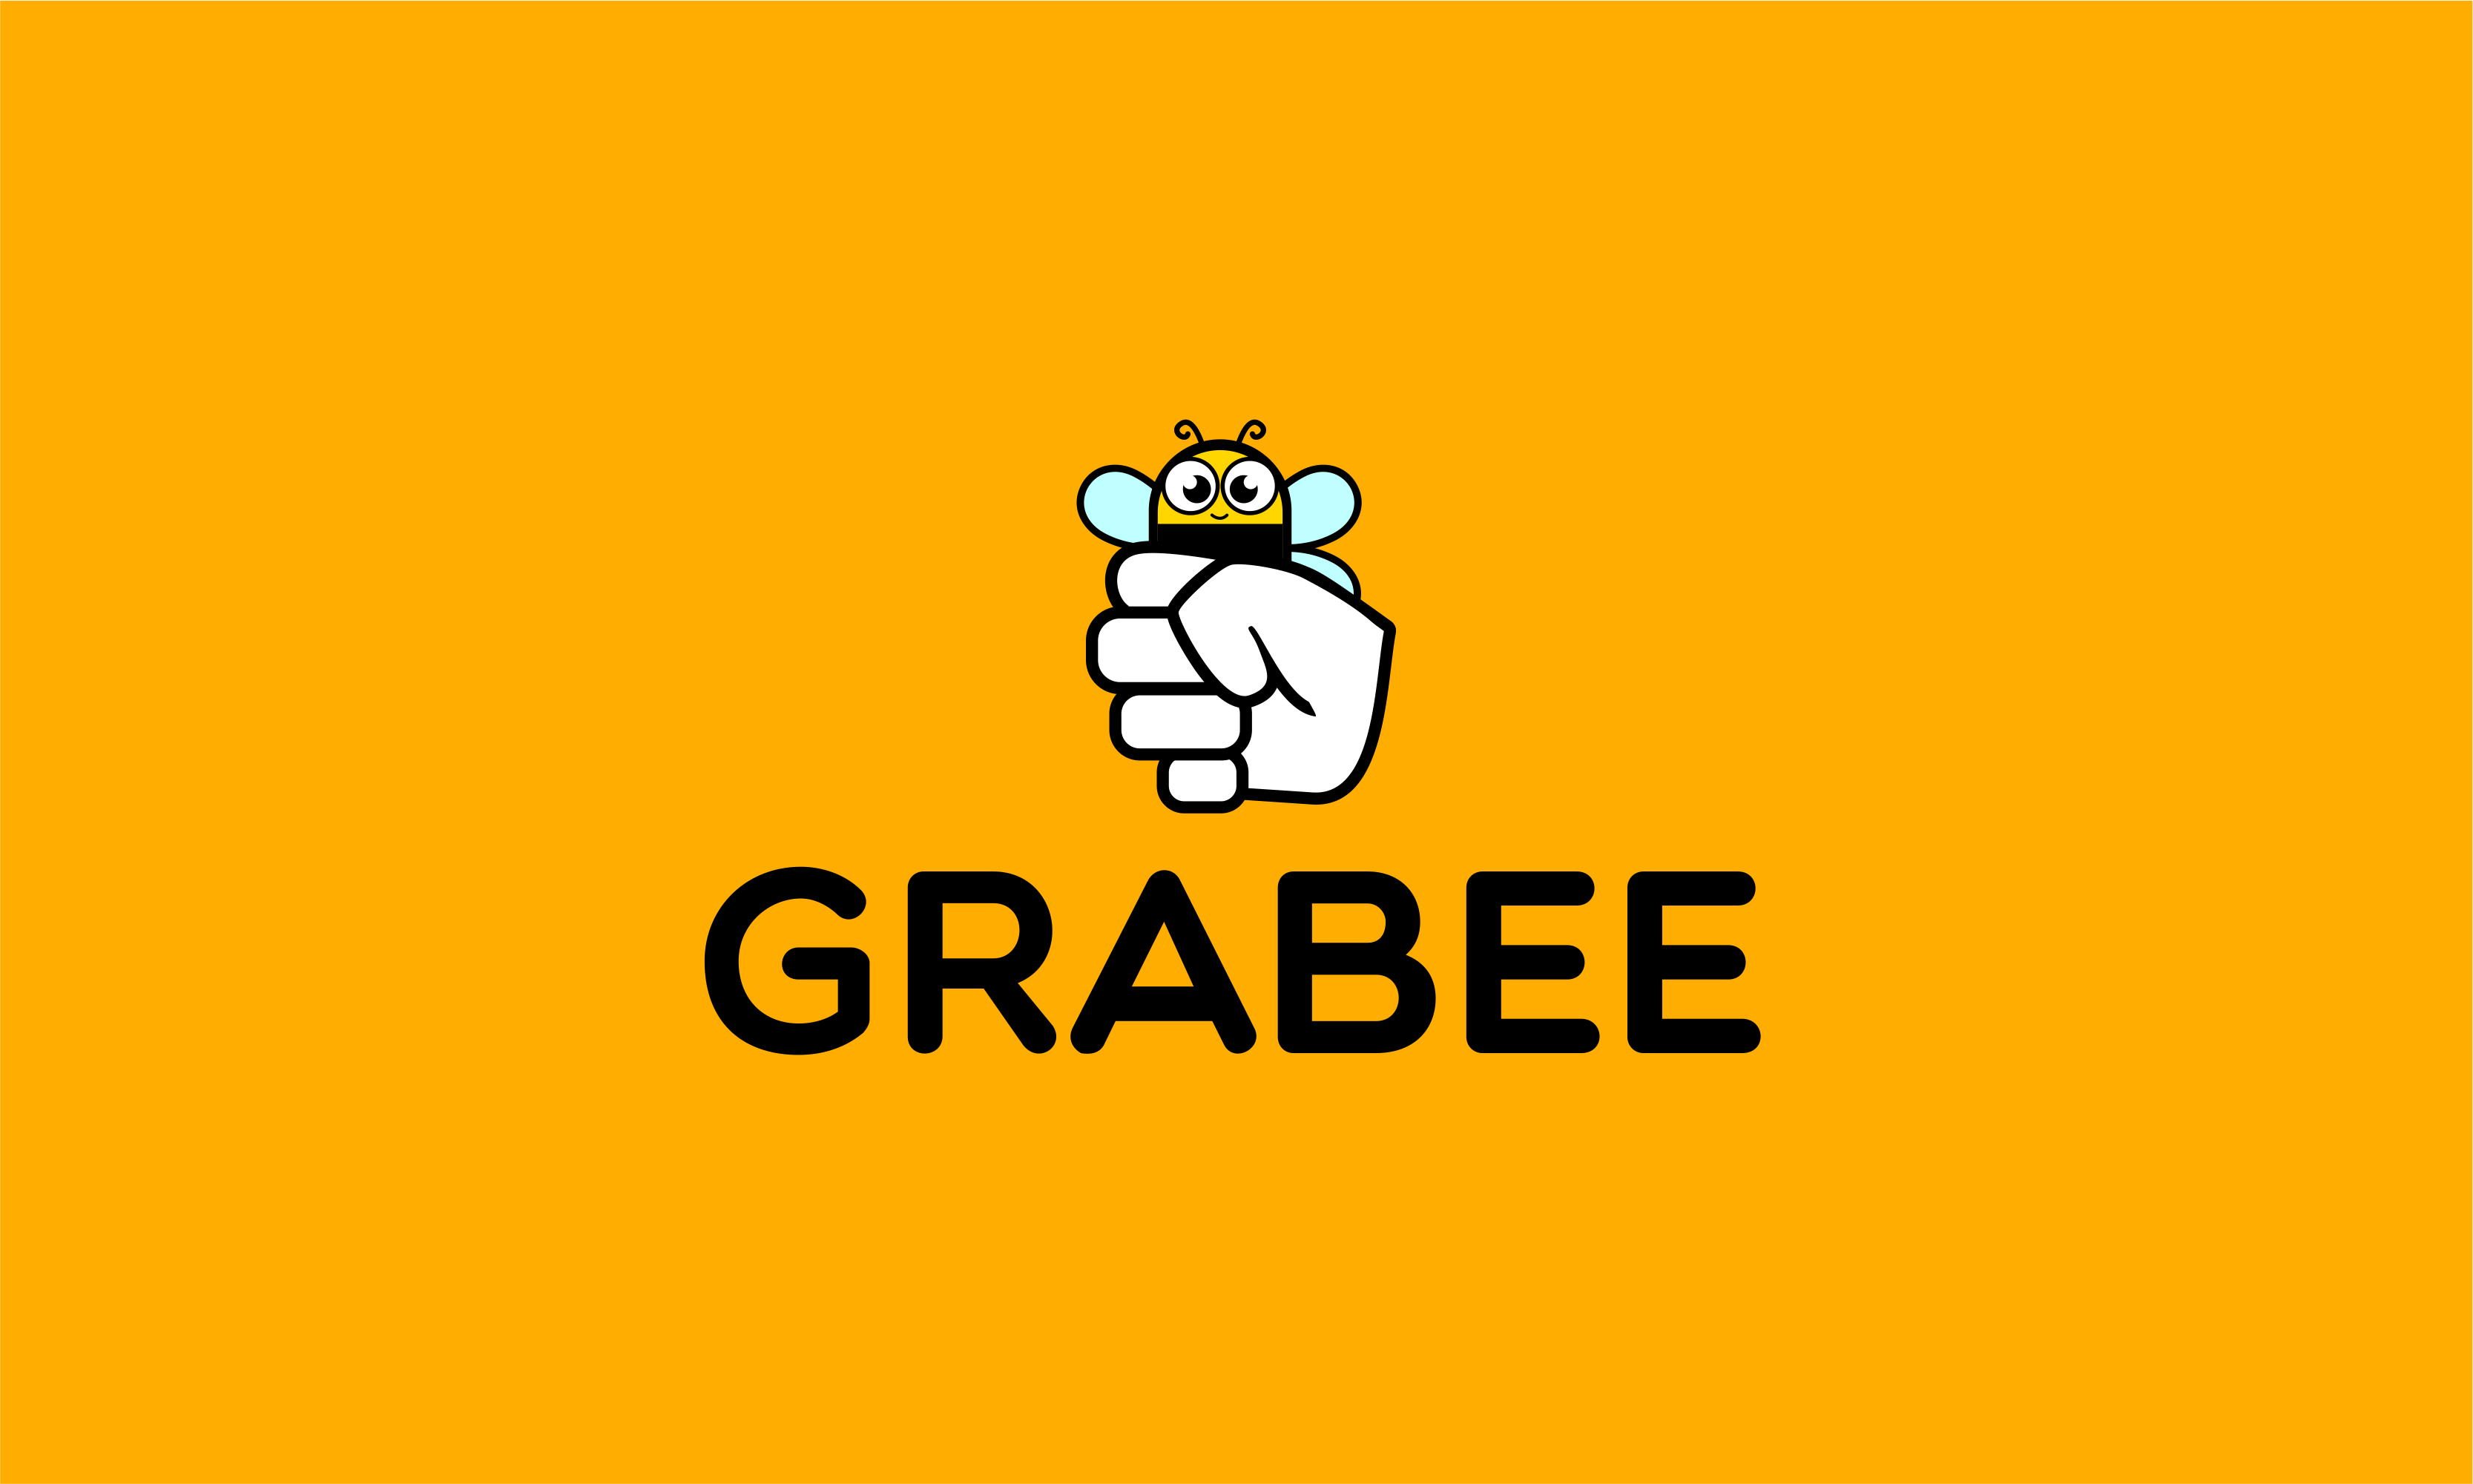 Grabee